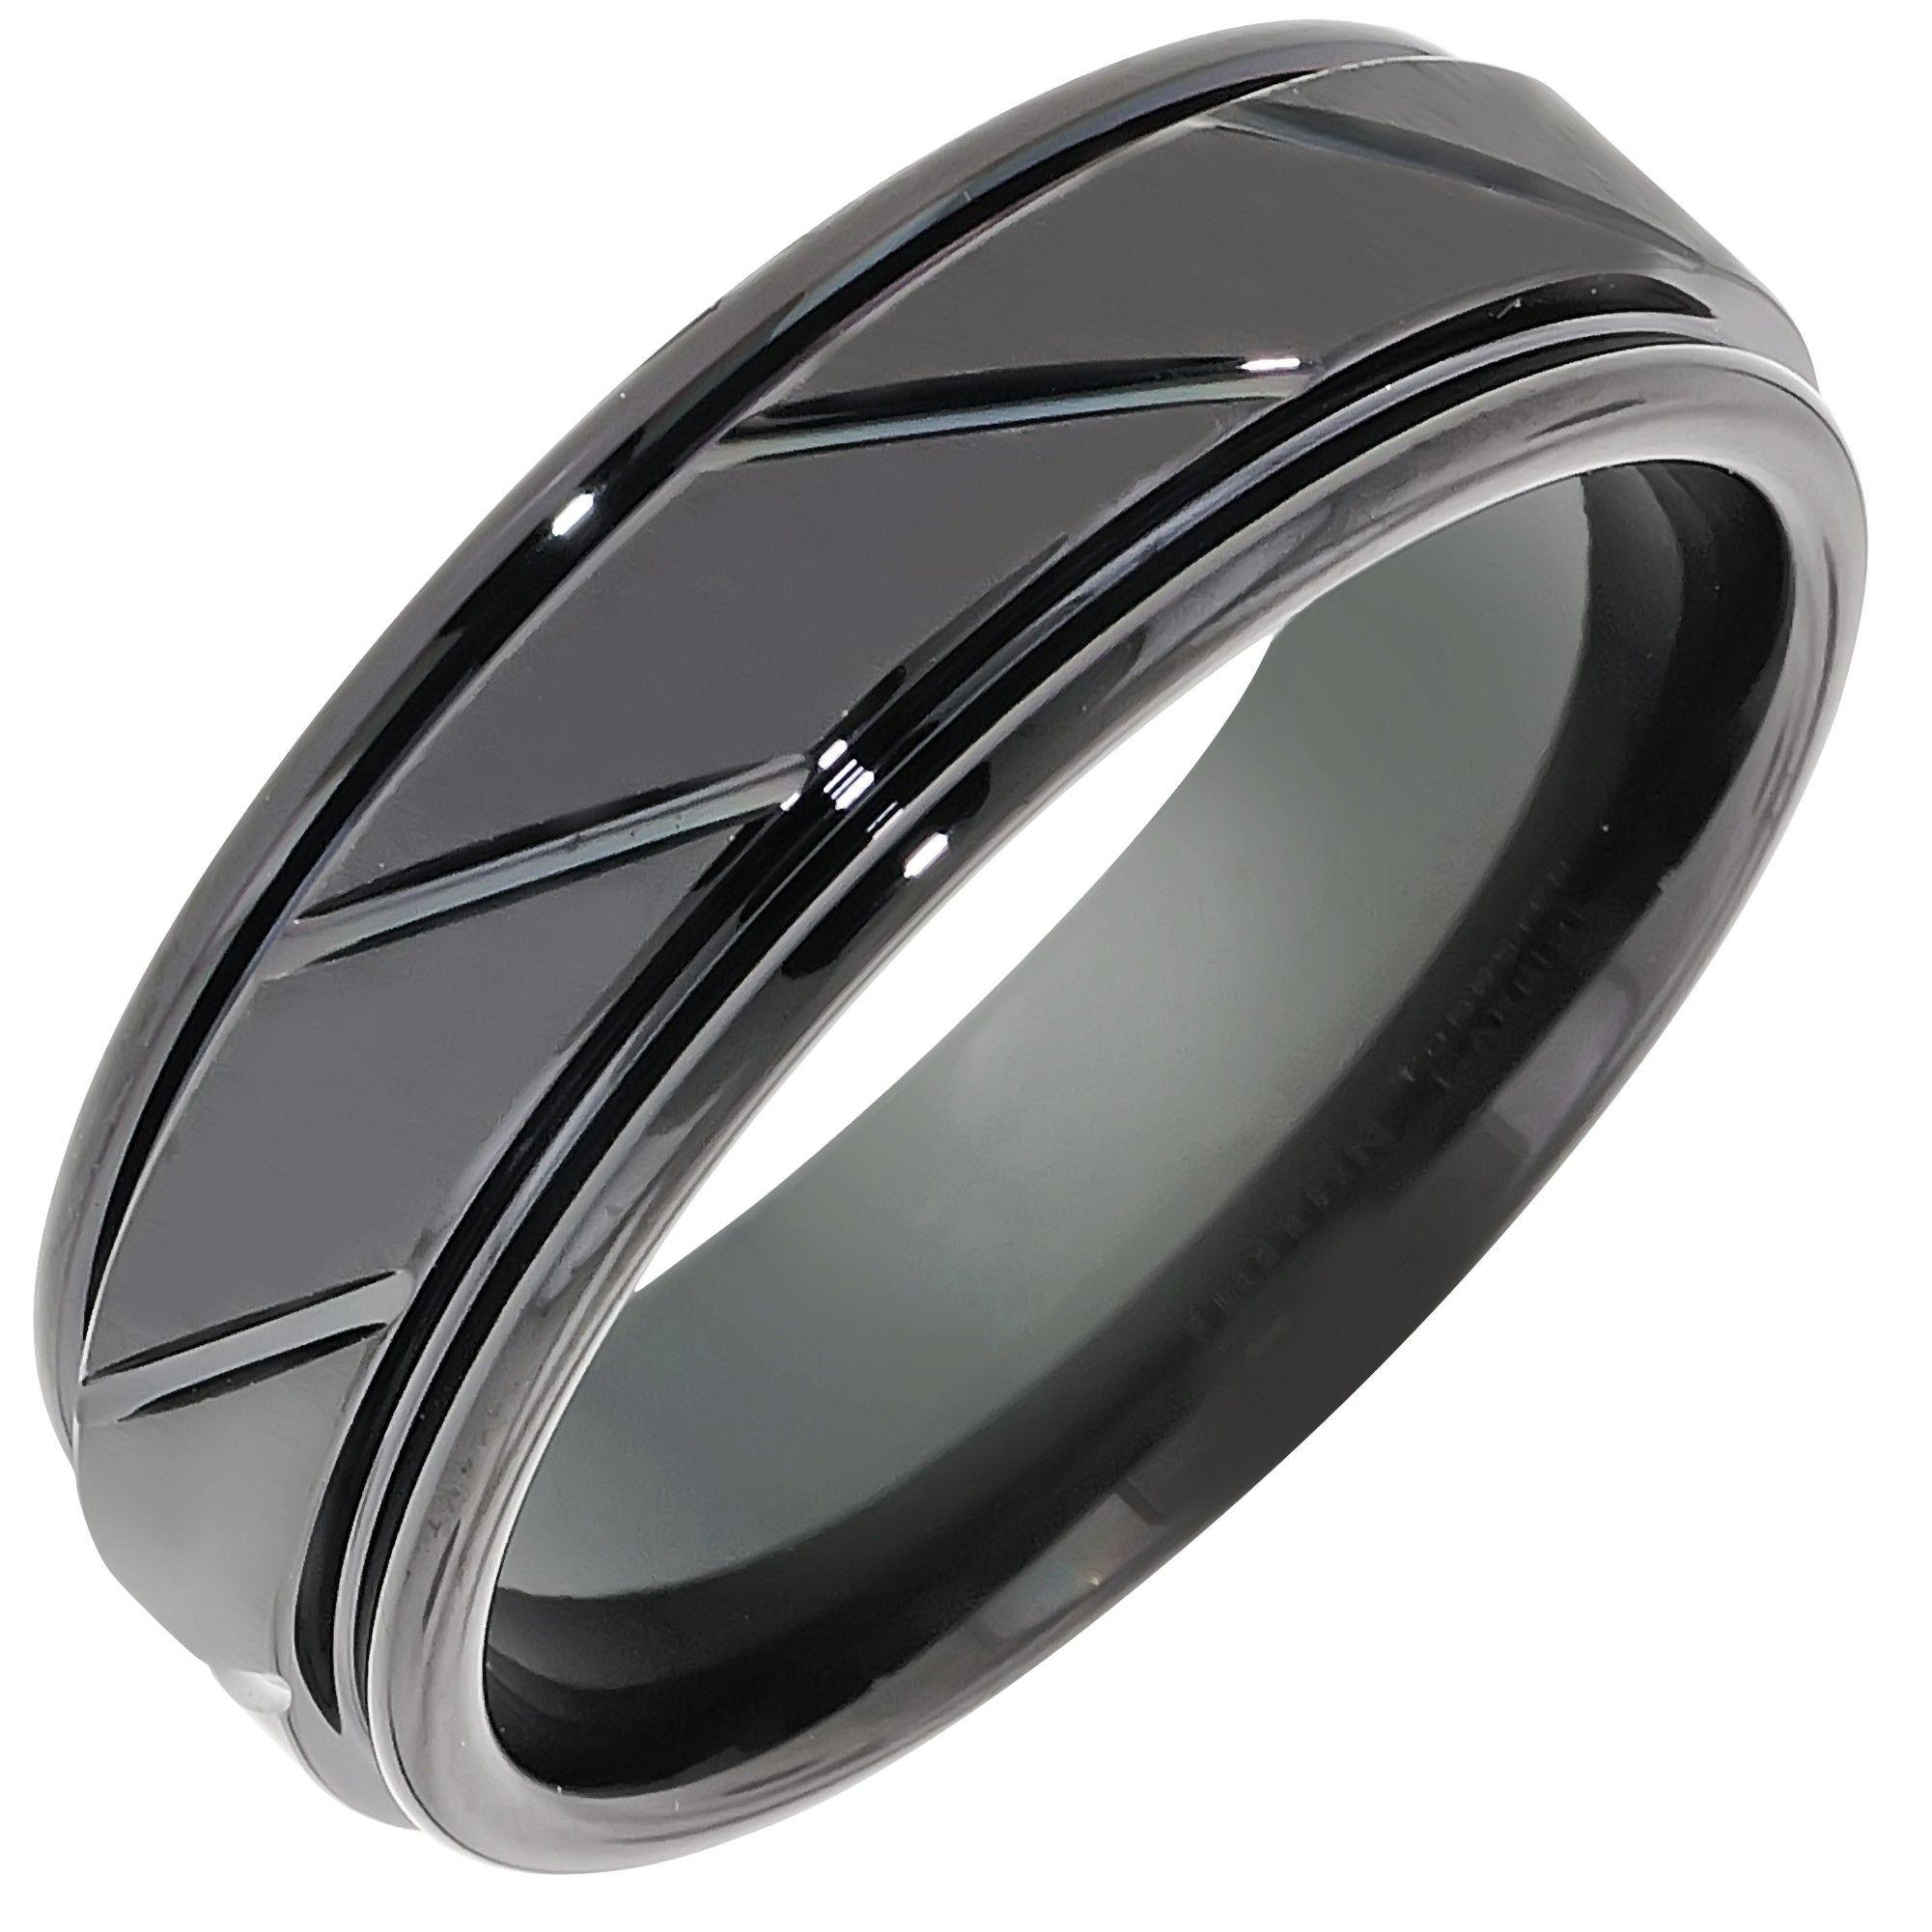 Triton Mens Comfort Fit Wedding Band in Black Tungsten